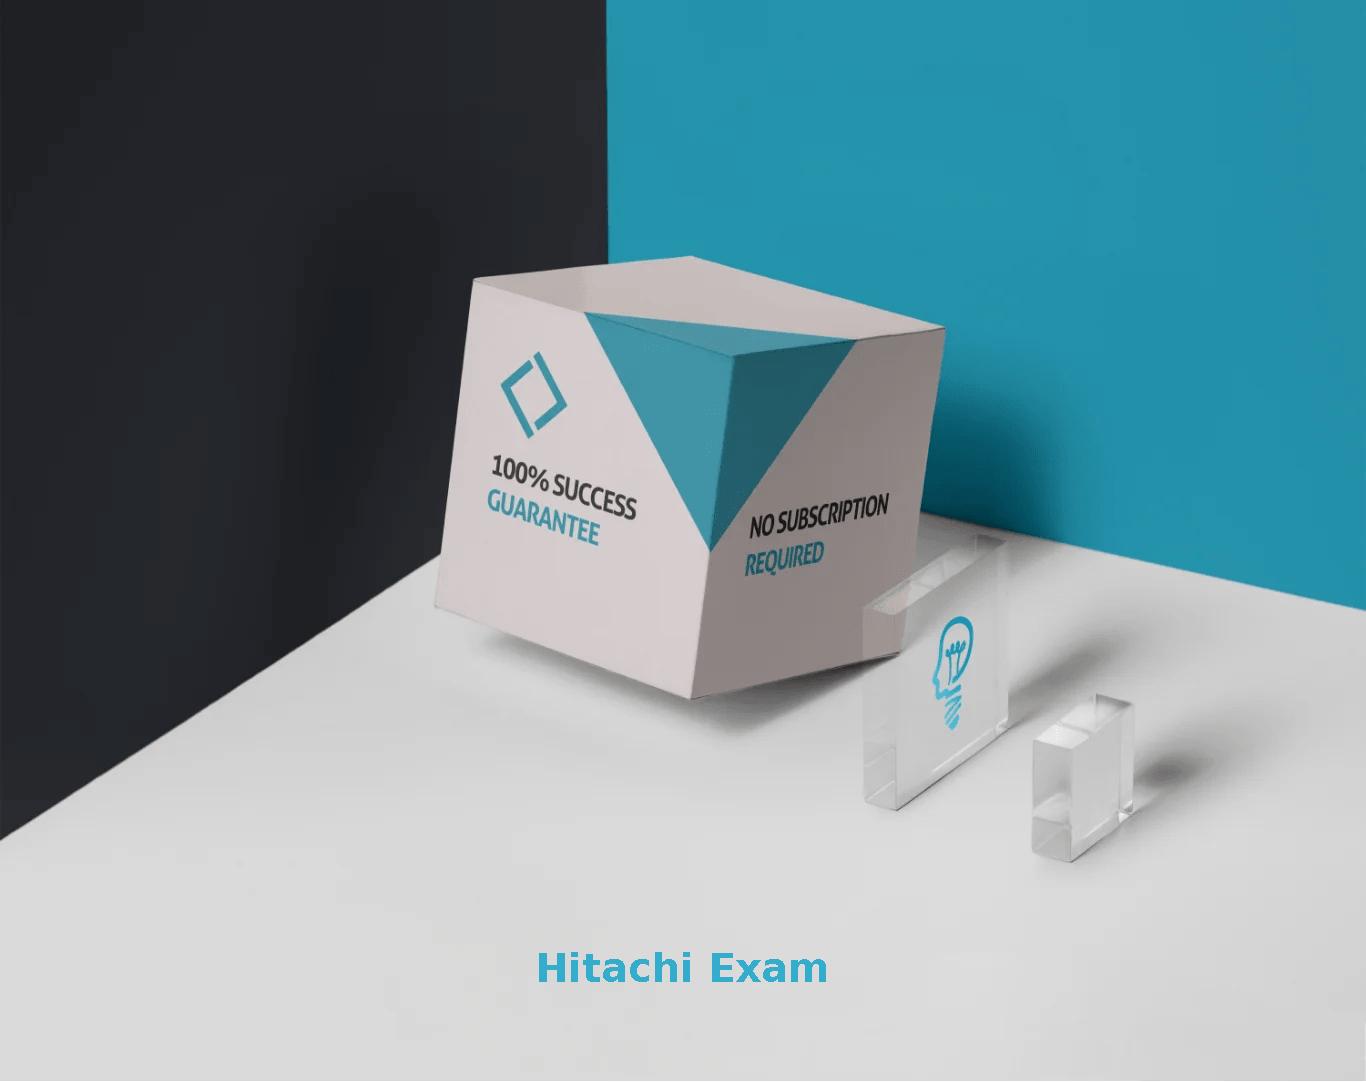 Hitachi Exam Dumps